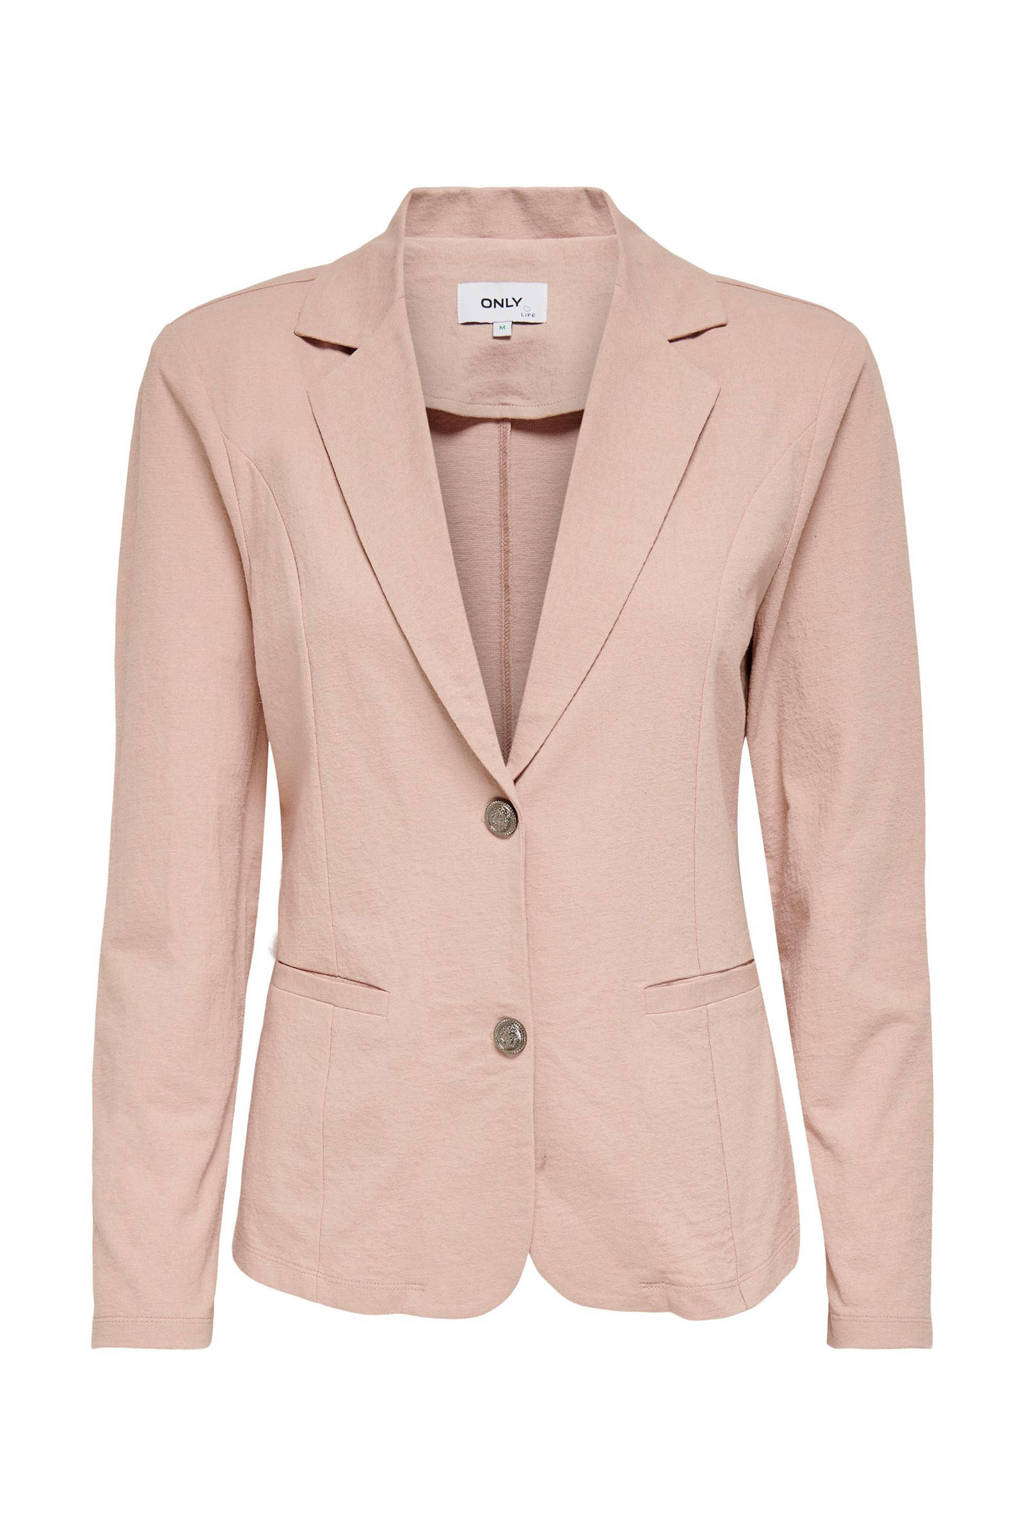 ONLY blazer ONLKIRAS  roze, Roze